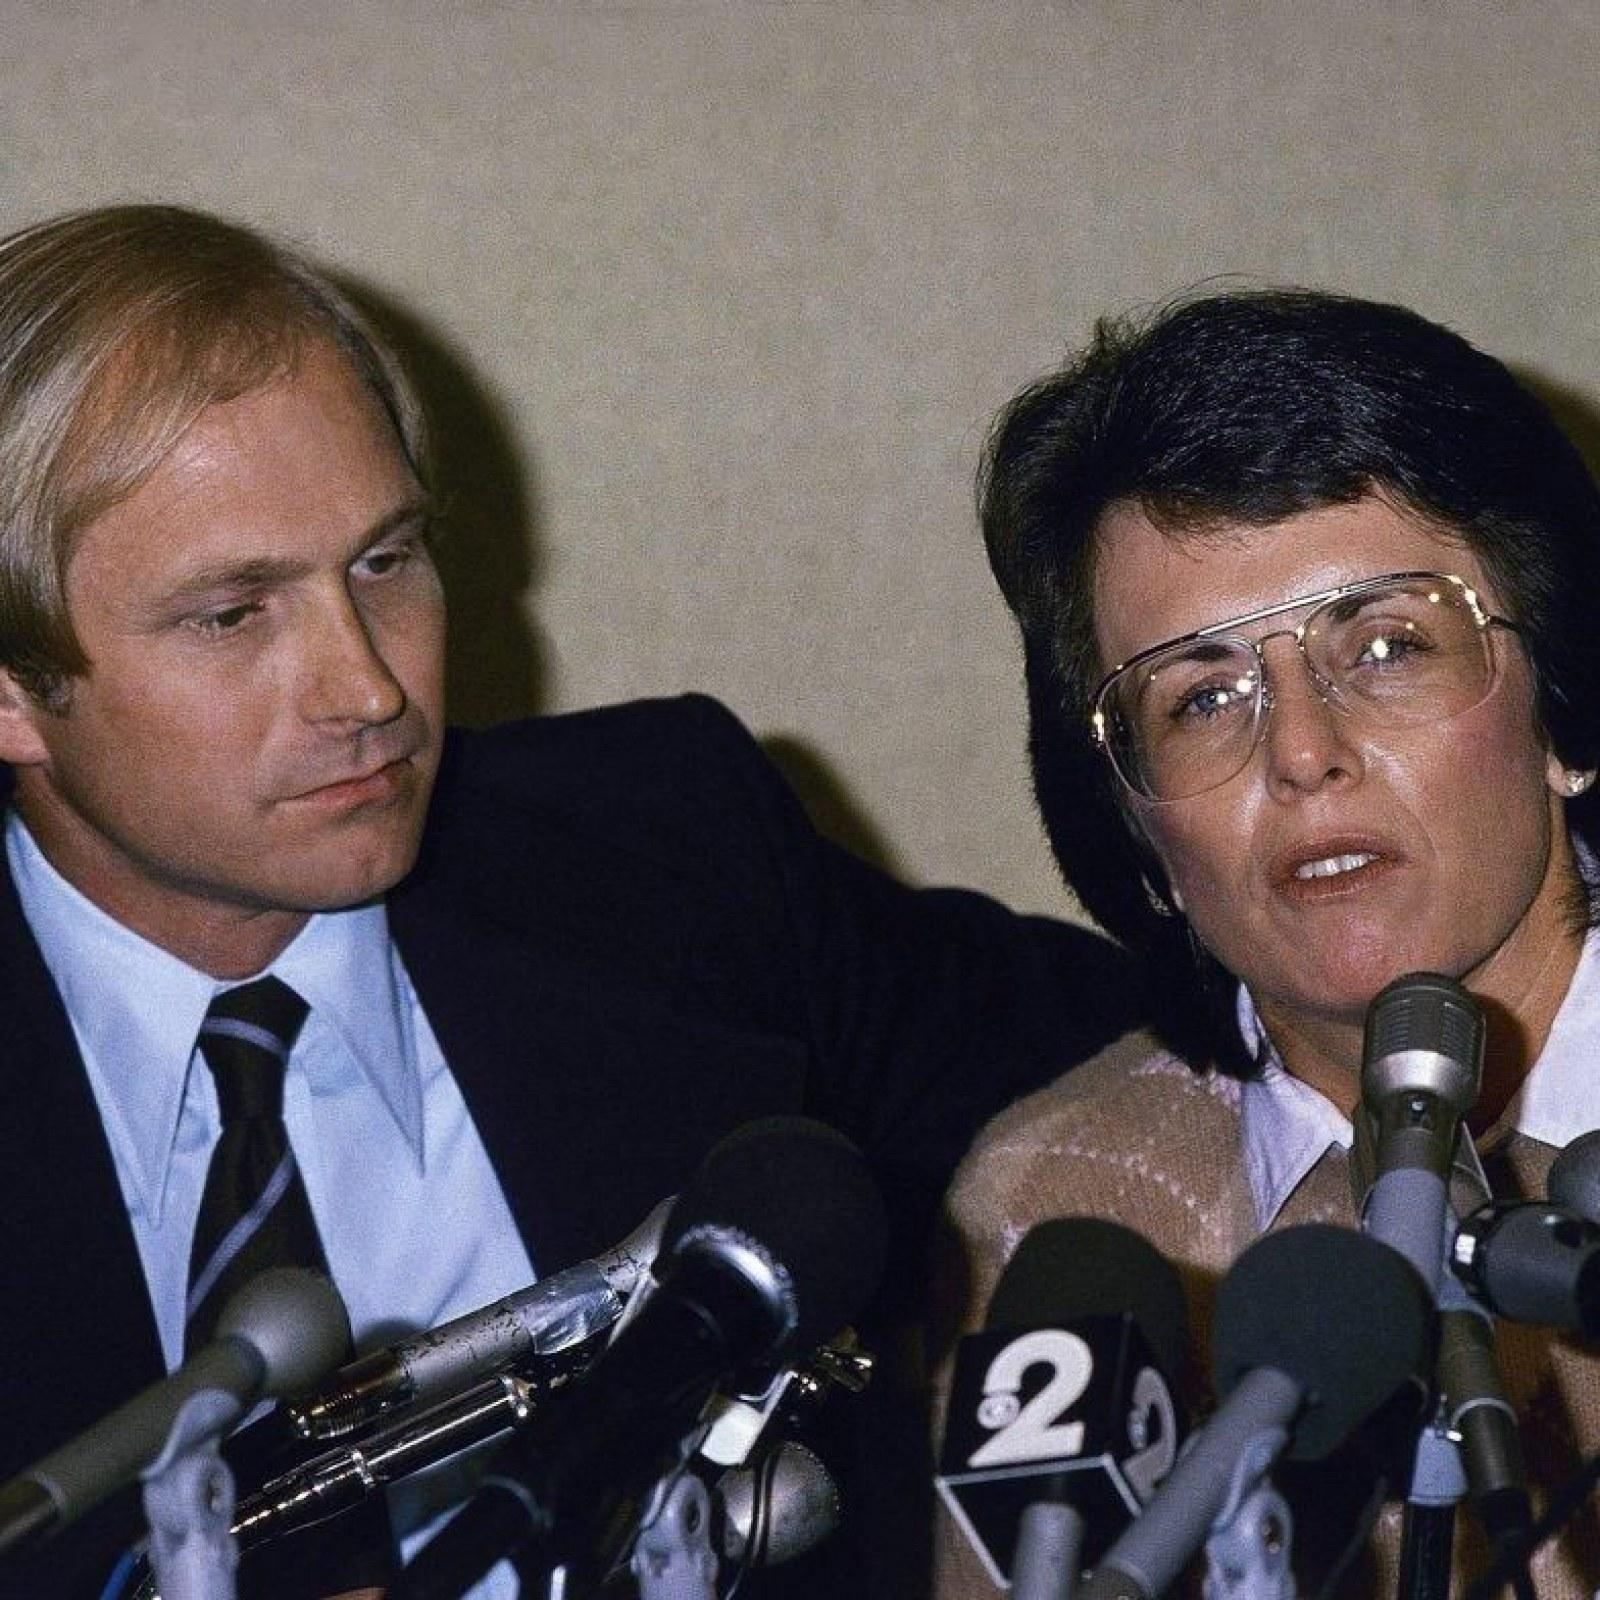 Battle of the Sexes' Sugarcoats Billie Jean King's Tragic